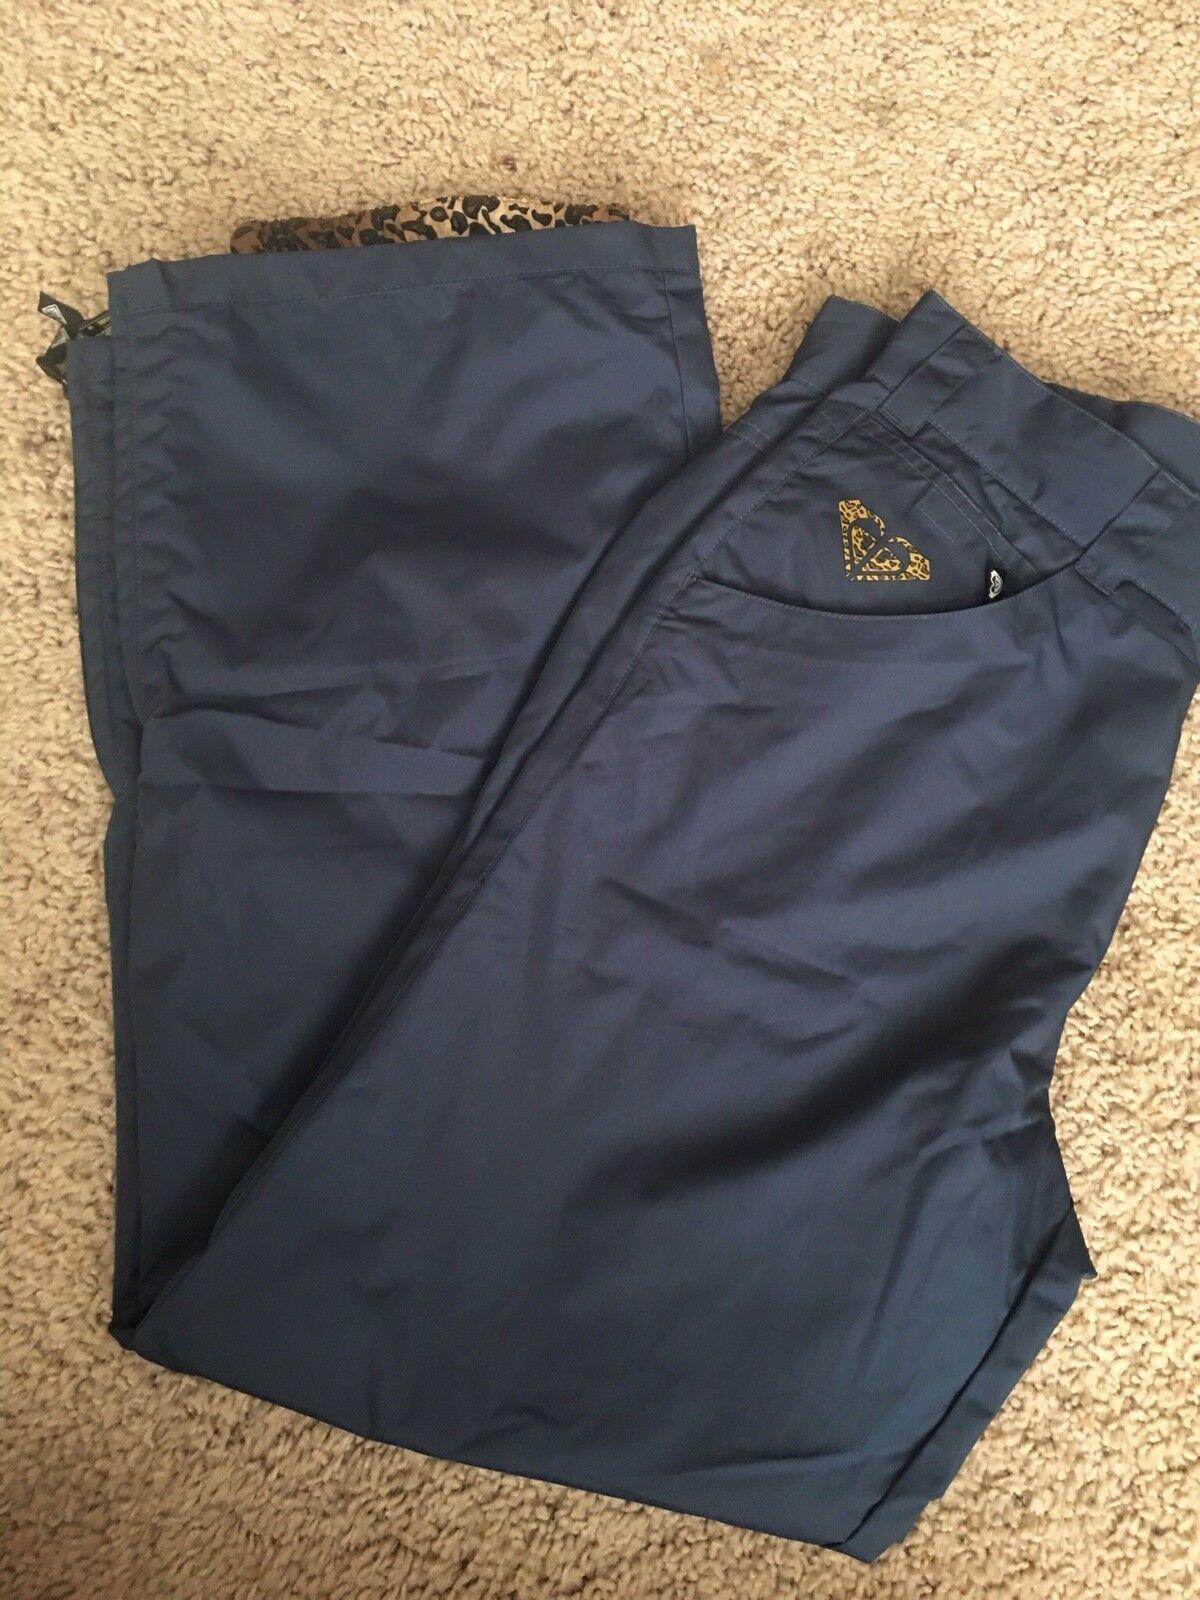 Roxy Size M Navy bluee Leopard print X-series Snowboad Pants NEW ski rare 2003